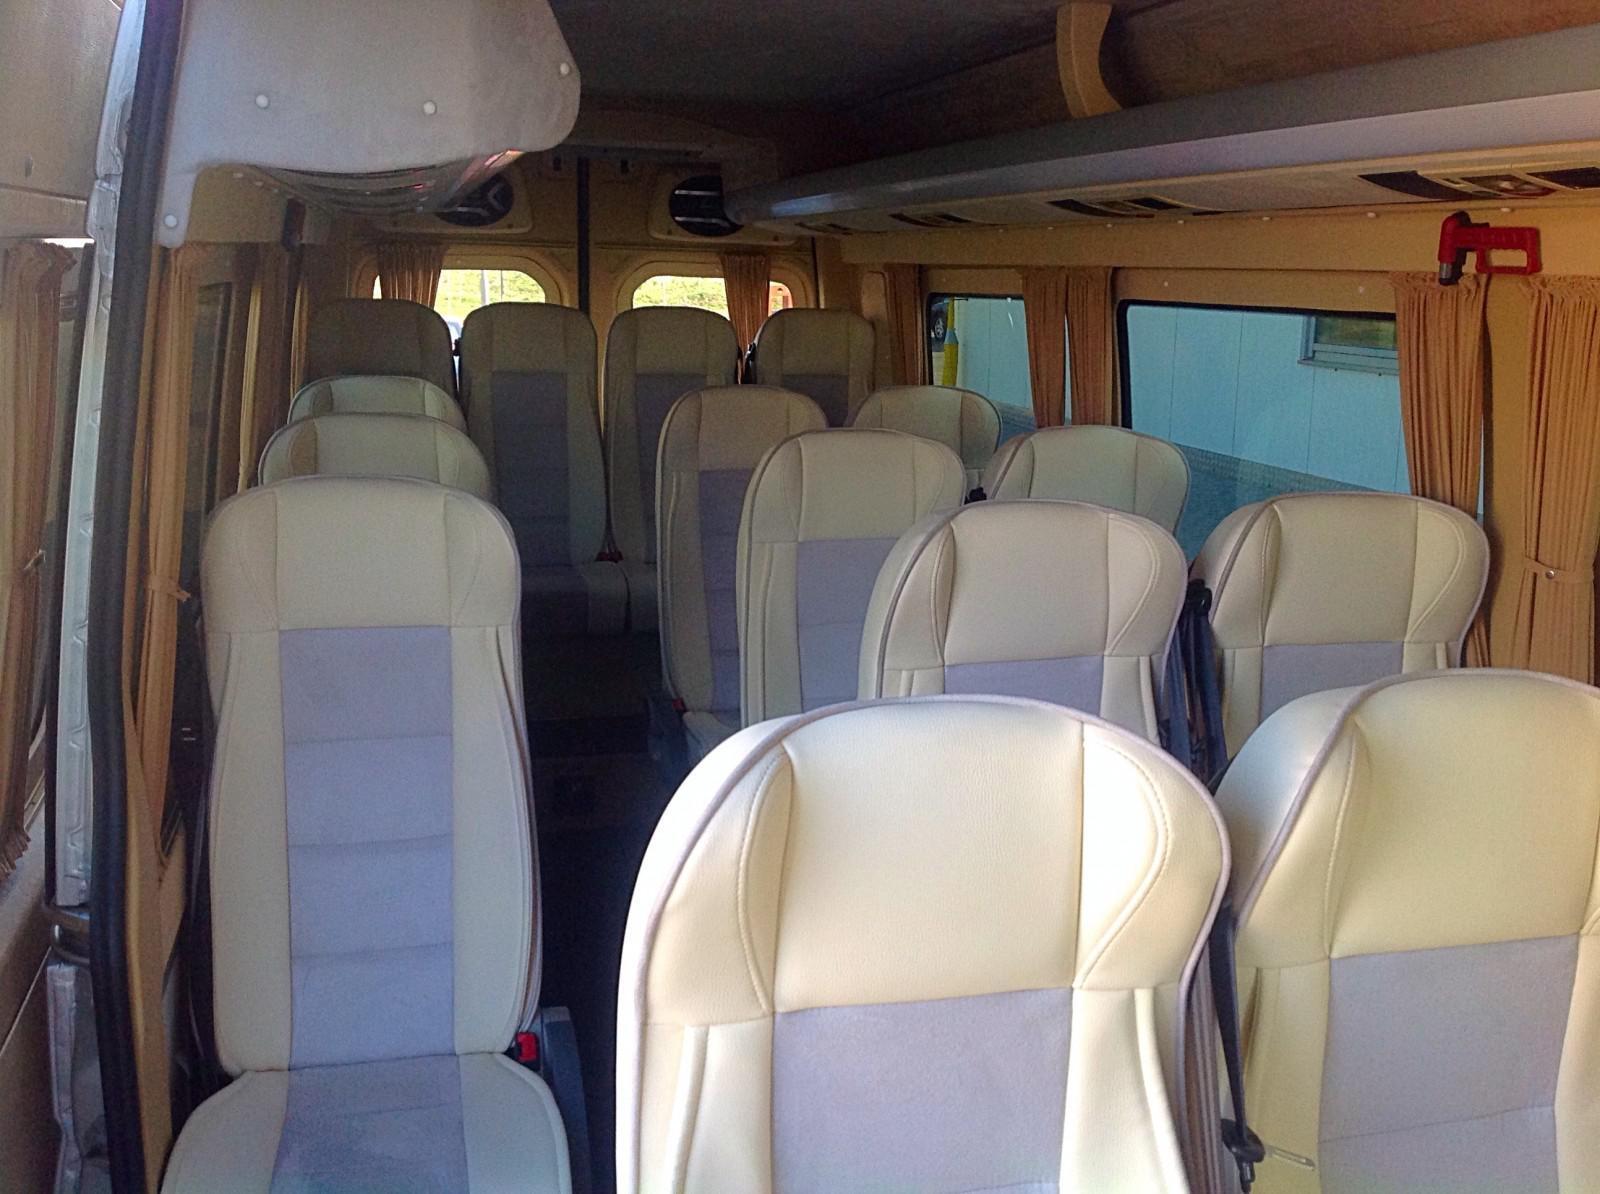 Микроавтобус MERCEDES 19 мест - фото 4